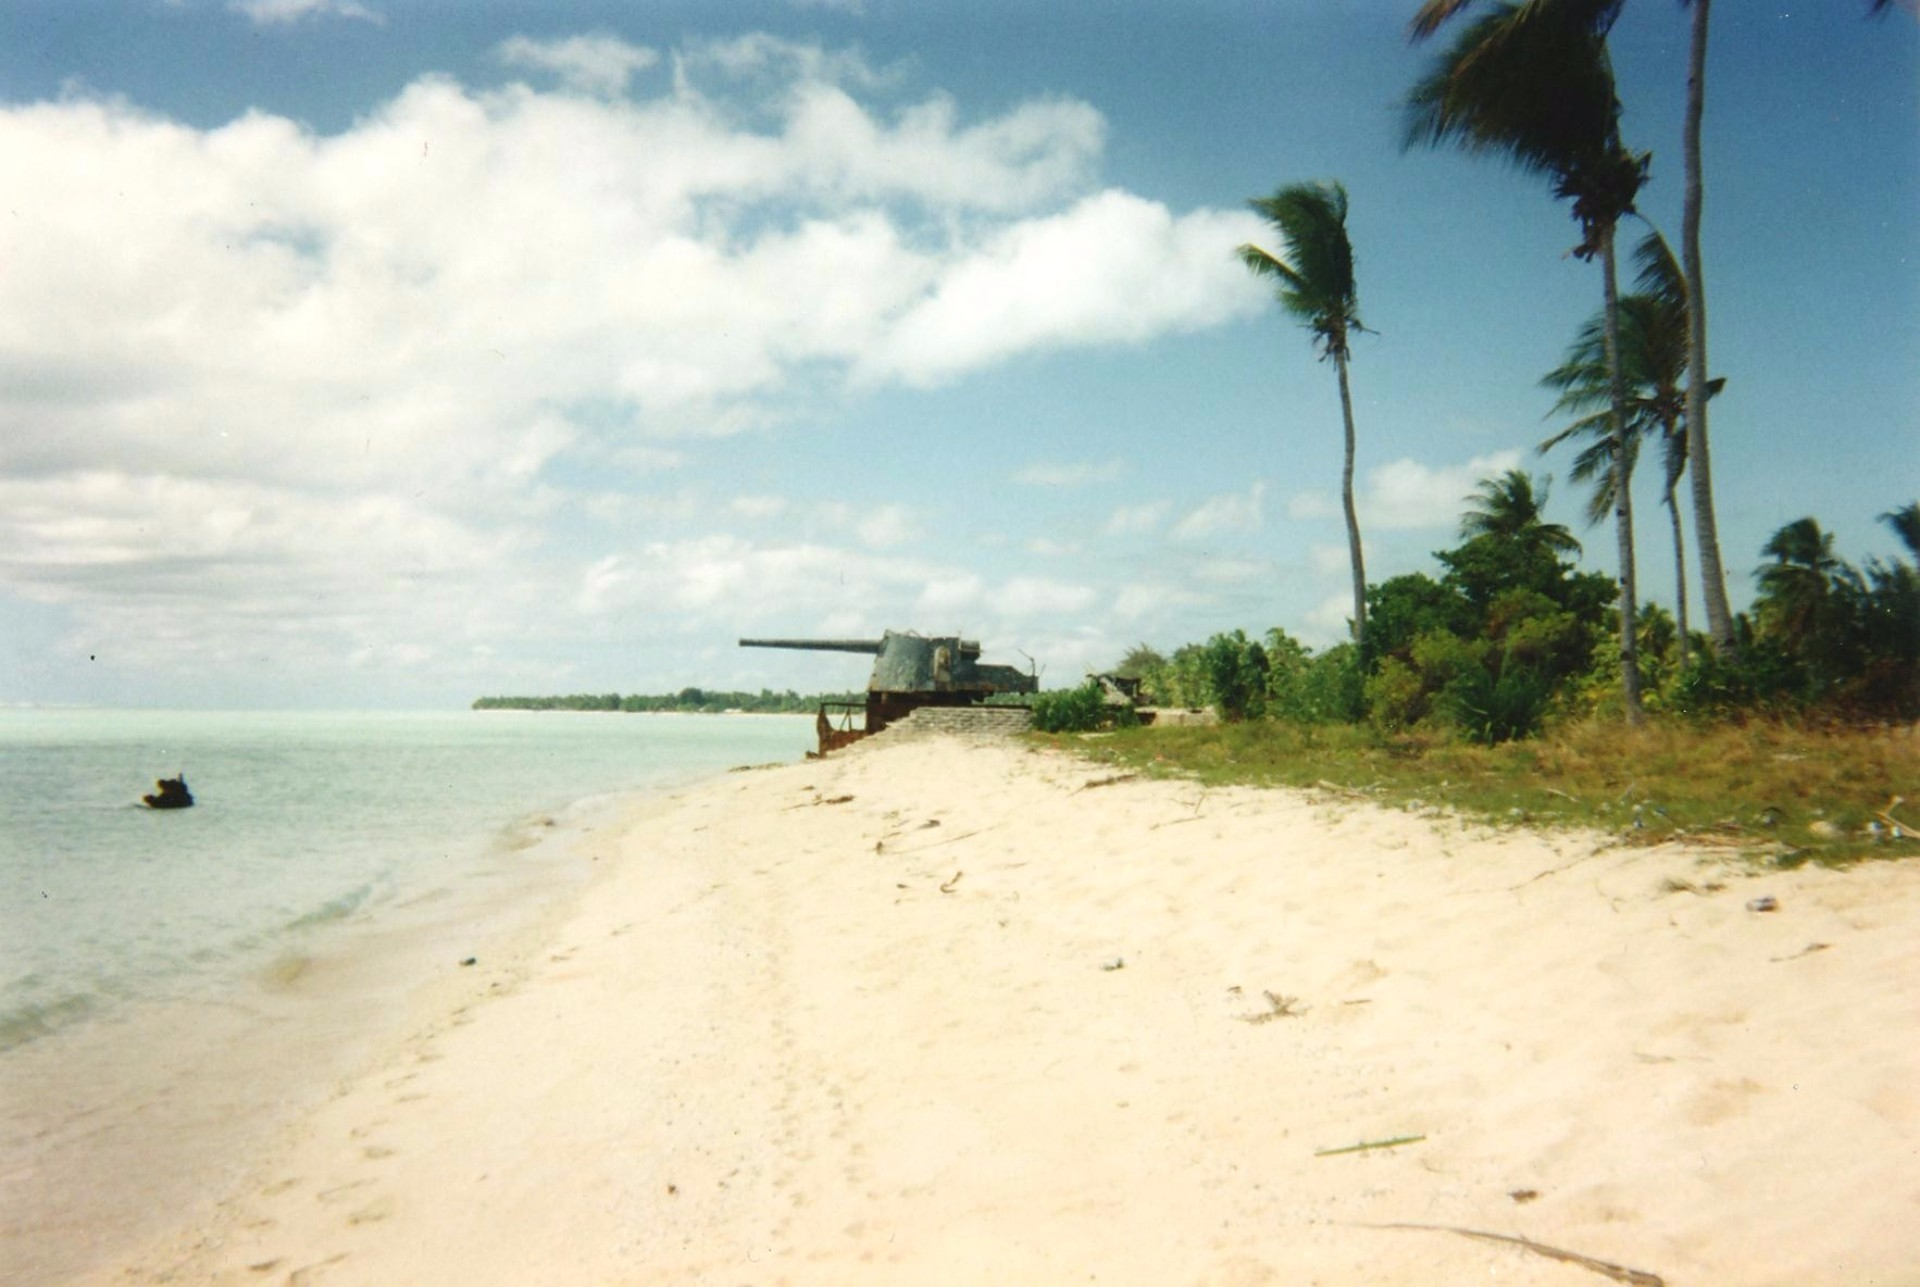 Kiribati Population in 2017